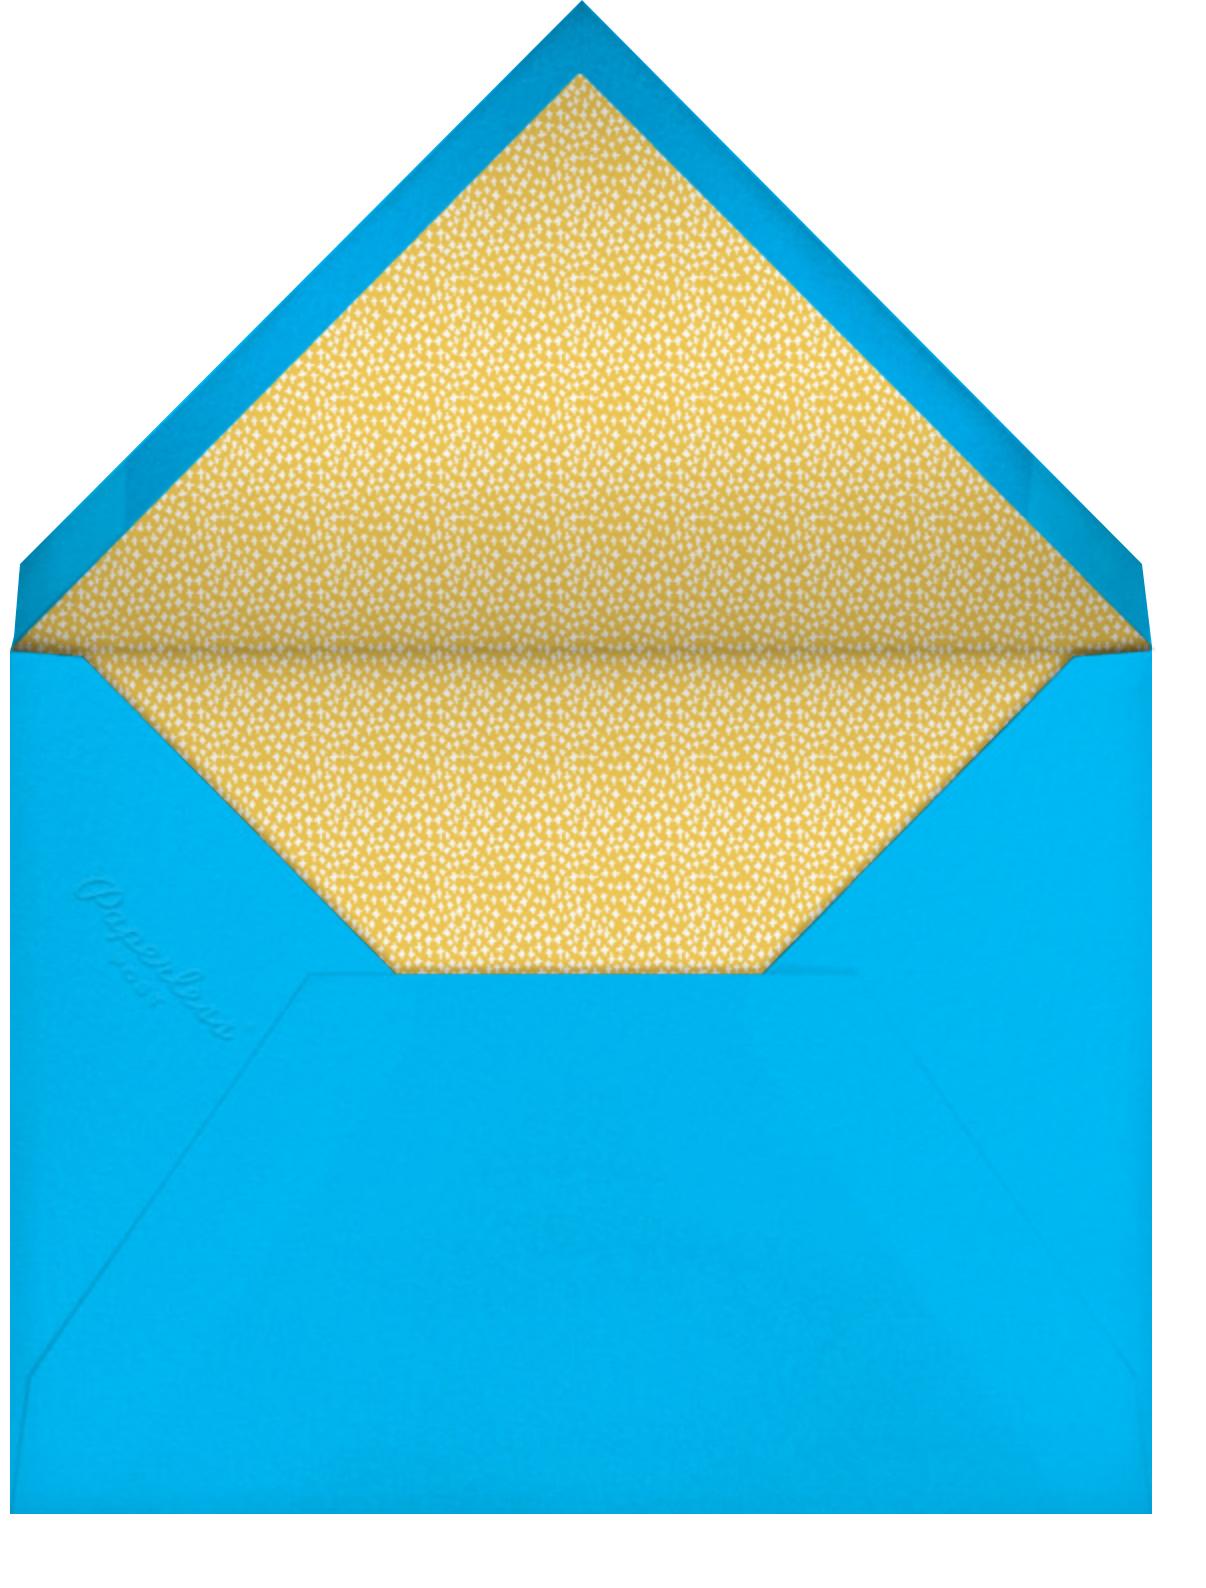 Rainbow Garden - Mr. Boddington's Studio - Get well - envelope back